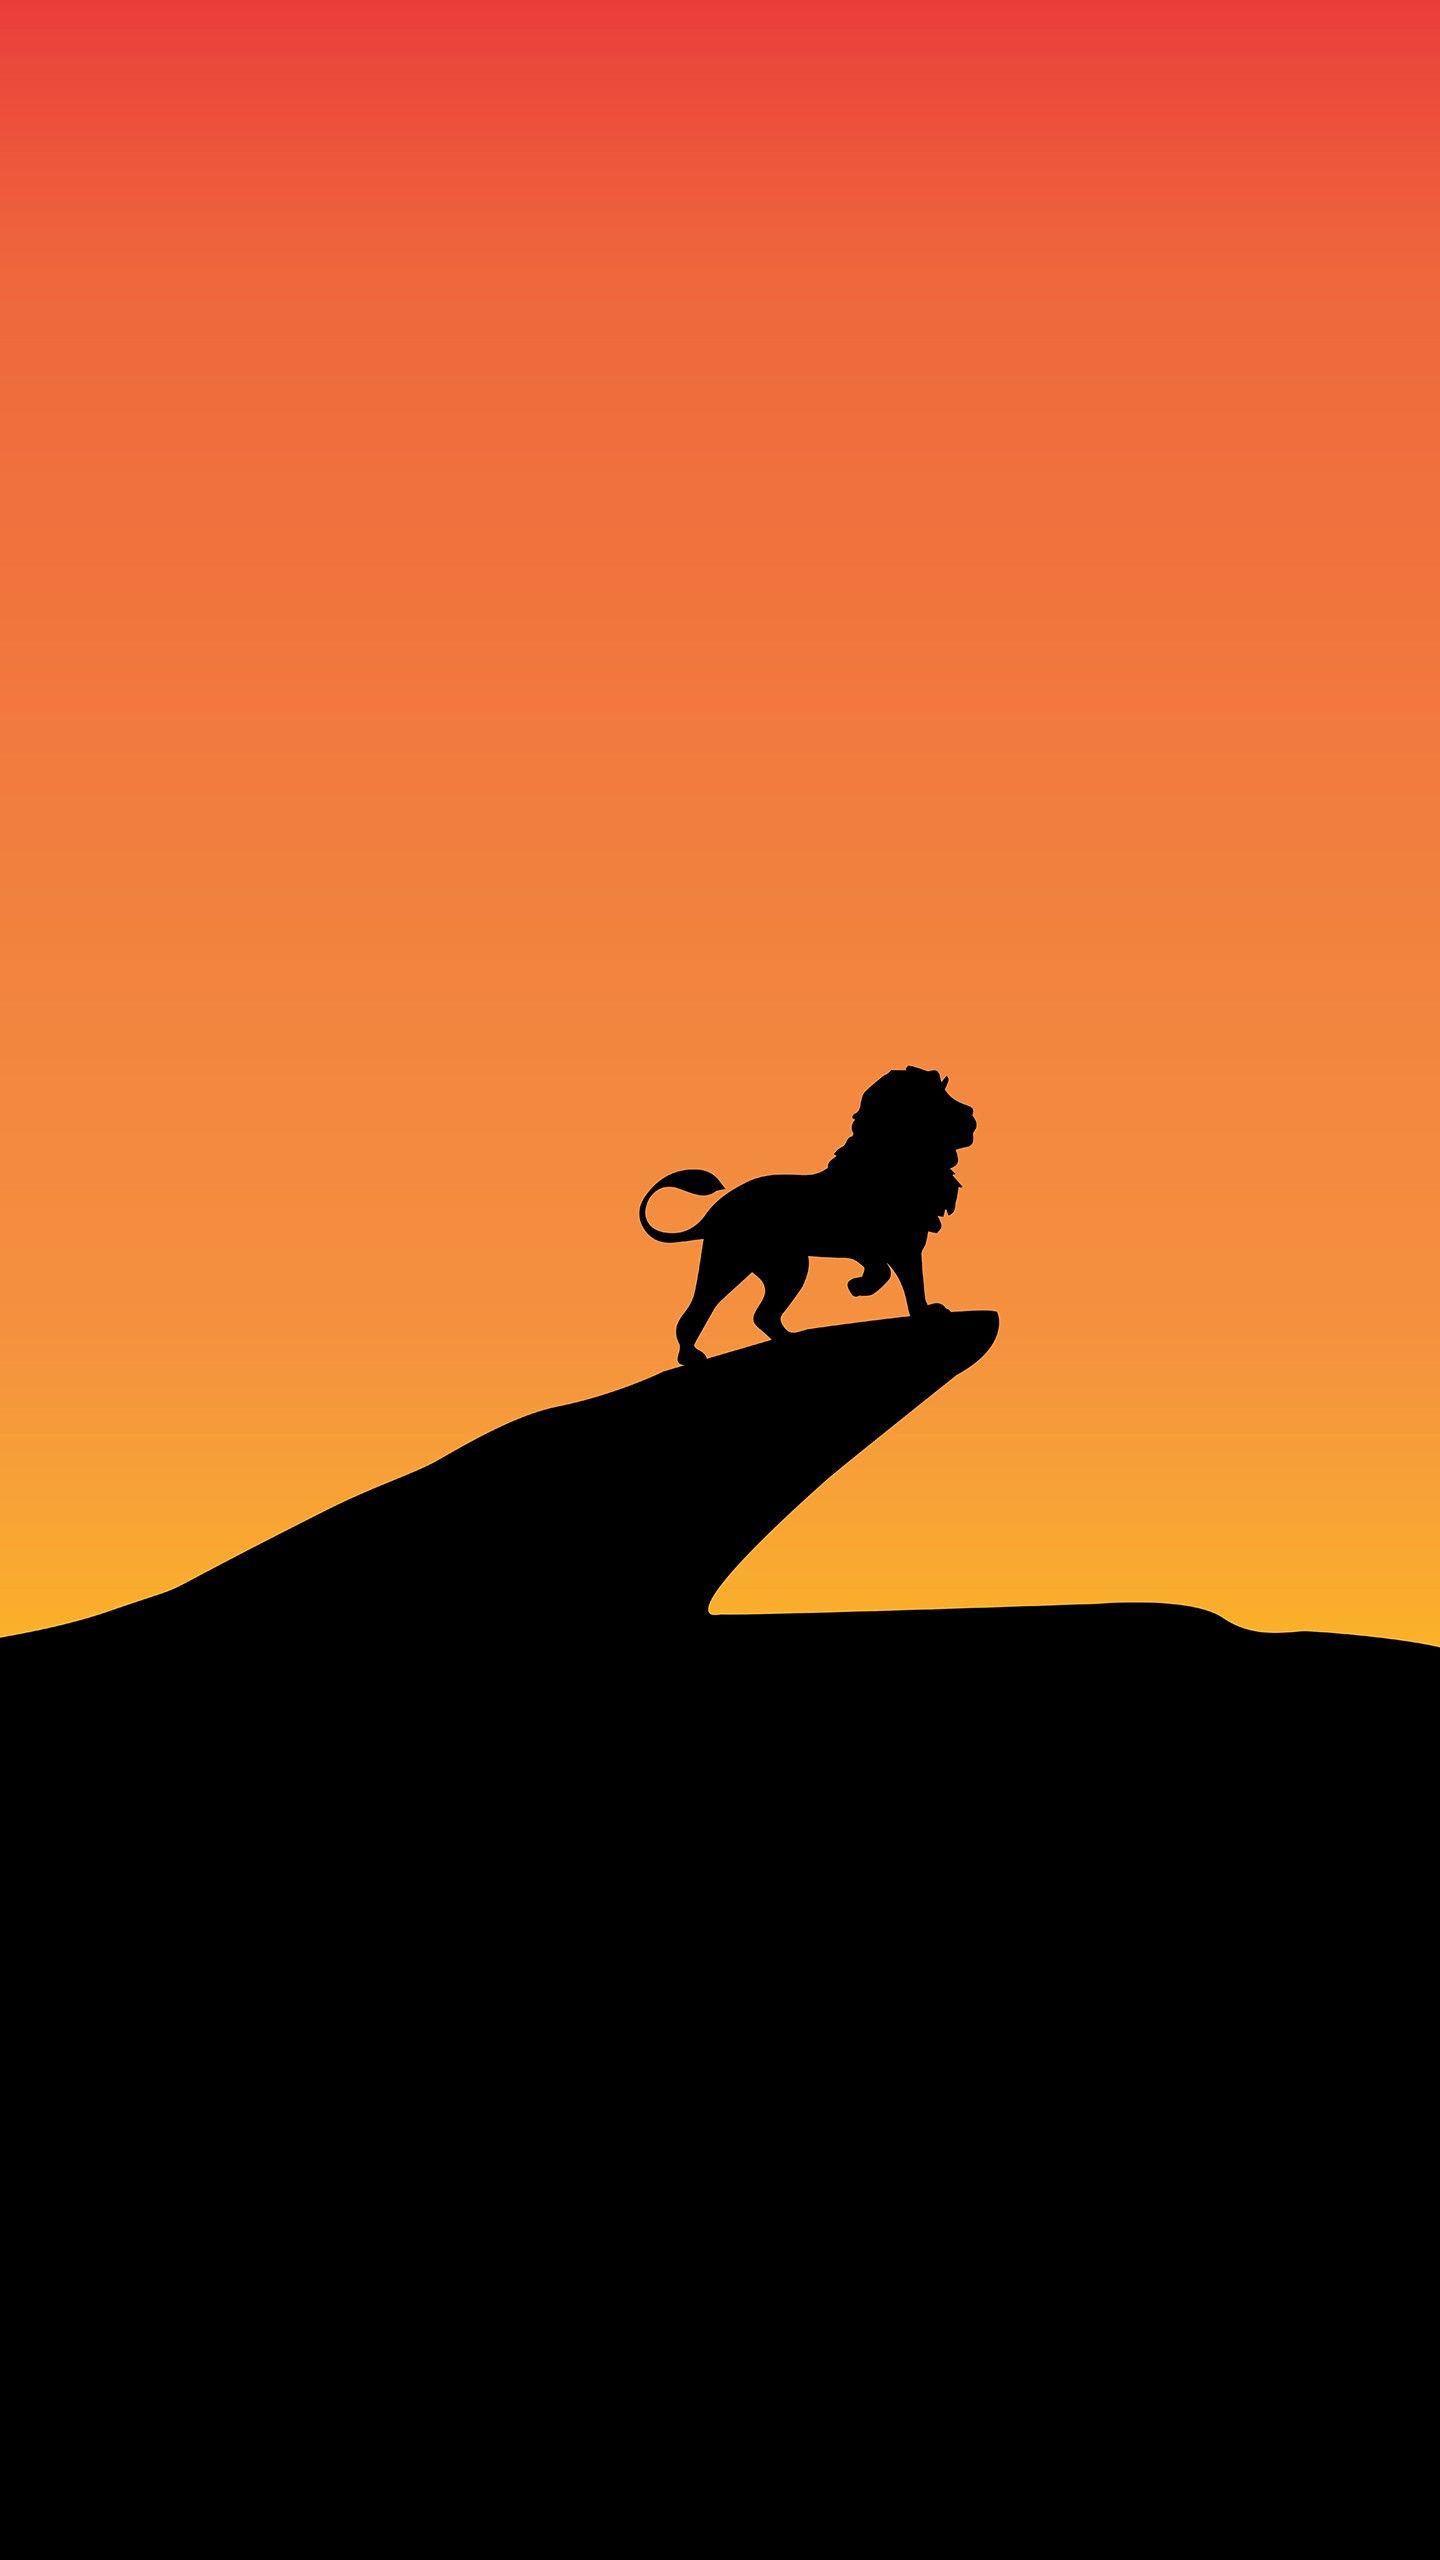 Misc Lion King Silhouette Minimal 4k 8k Wallpapers Lion Pictures Animal Wallpaper Minimal Wallpaper